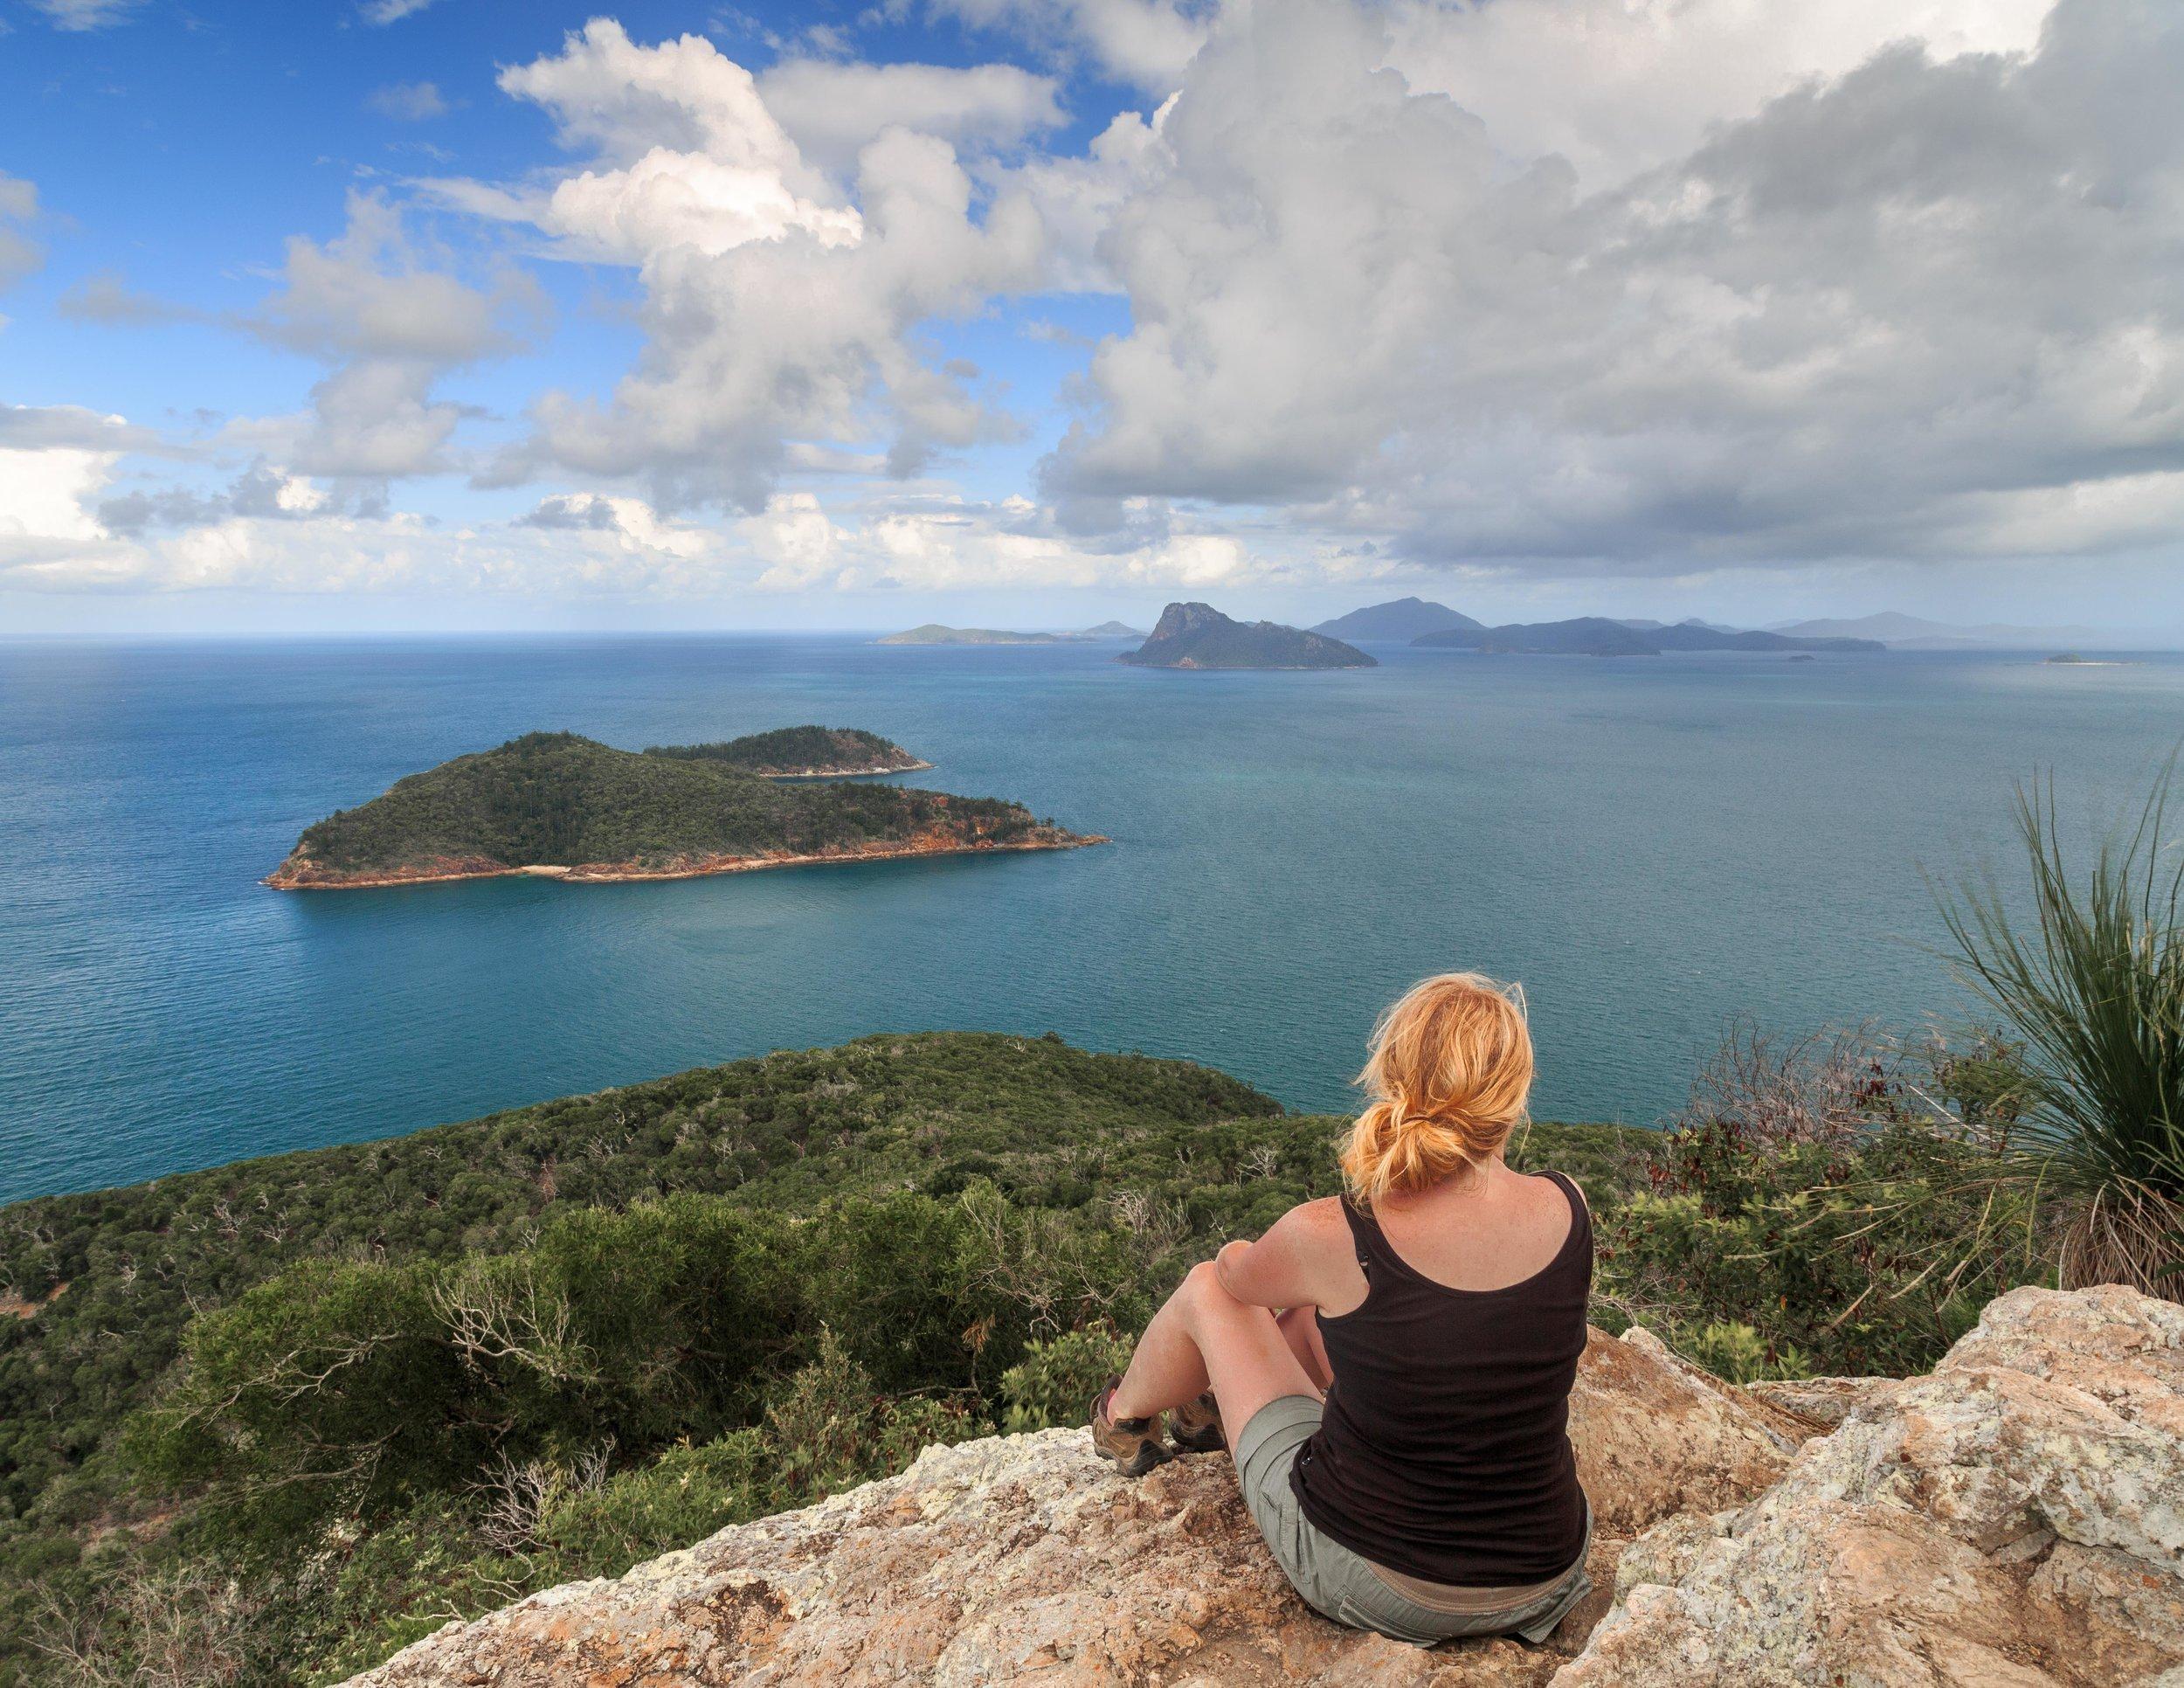 Four day itinerary to the Whitsundays: Passage Peak hike